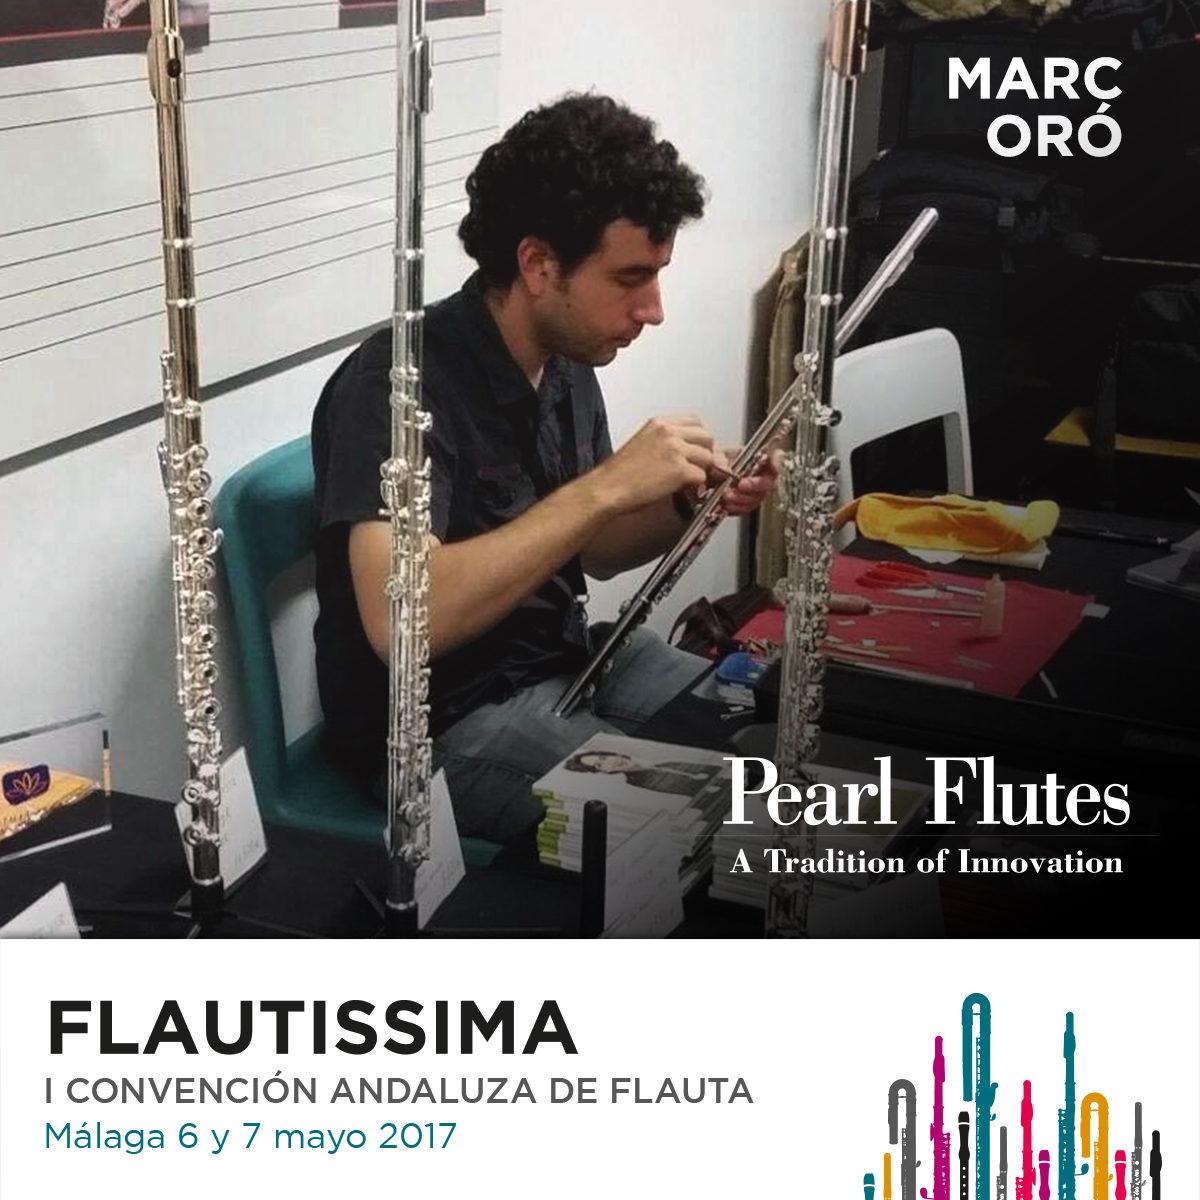 Marc Oró Flautissima